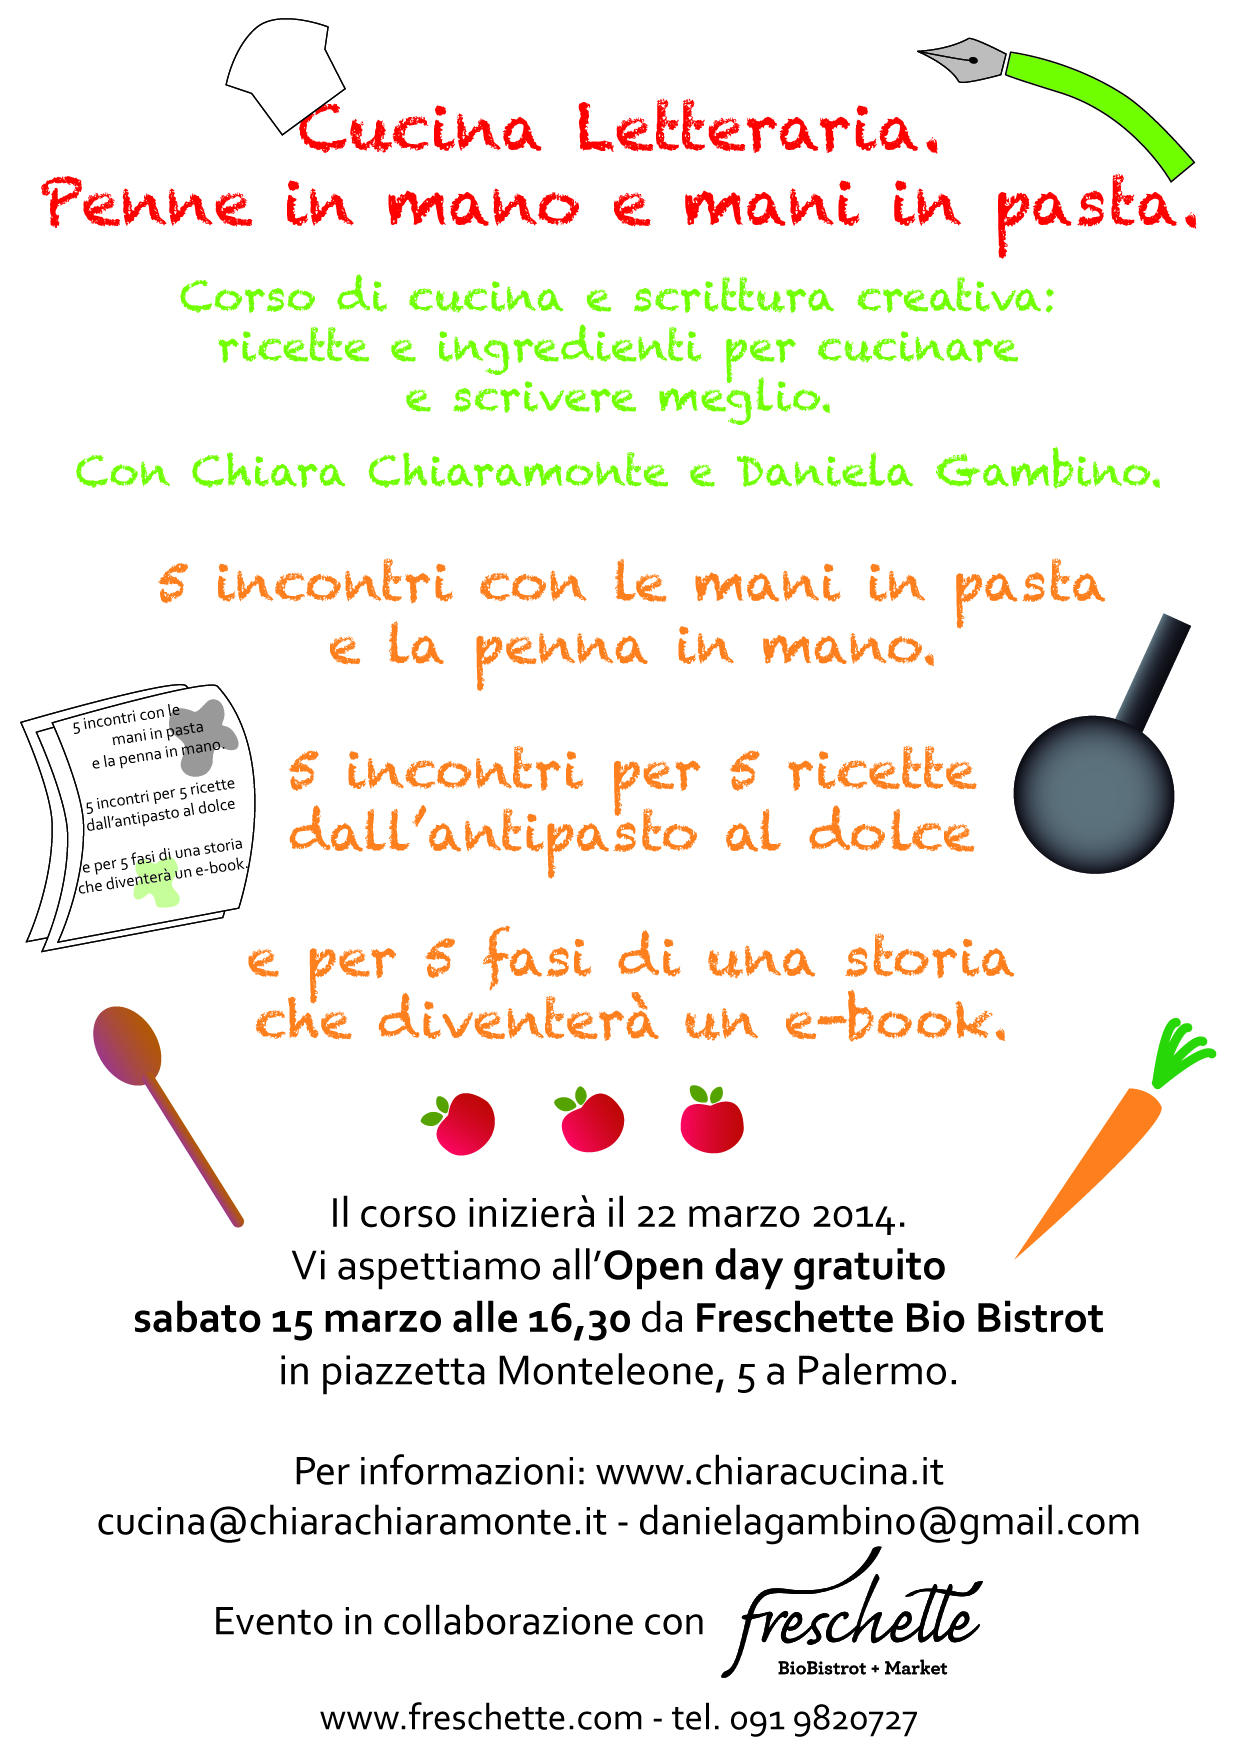 Cucina letteraria penne in mano e mani in pasta for Cucina per cucinare